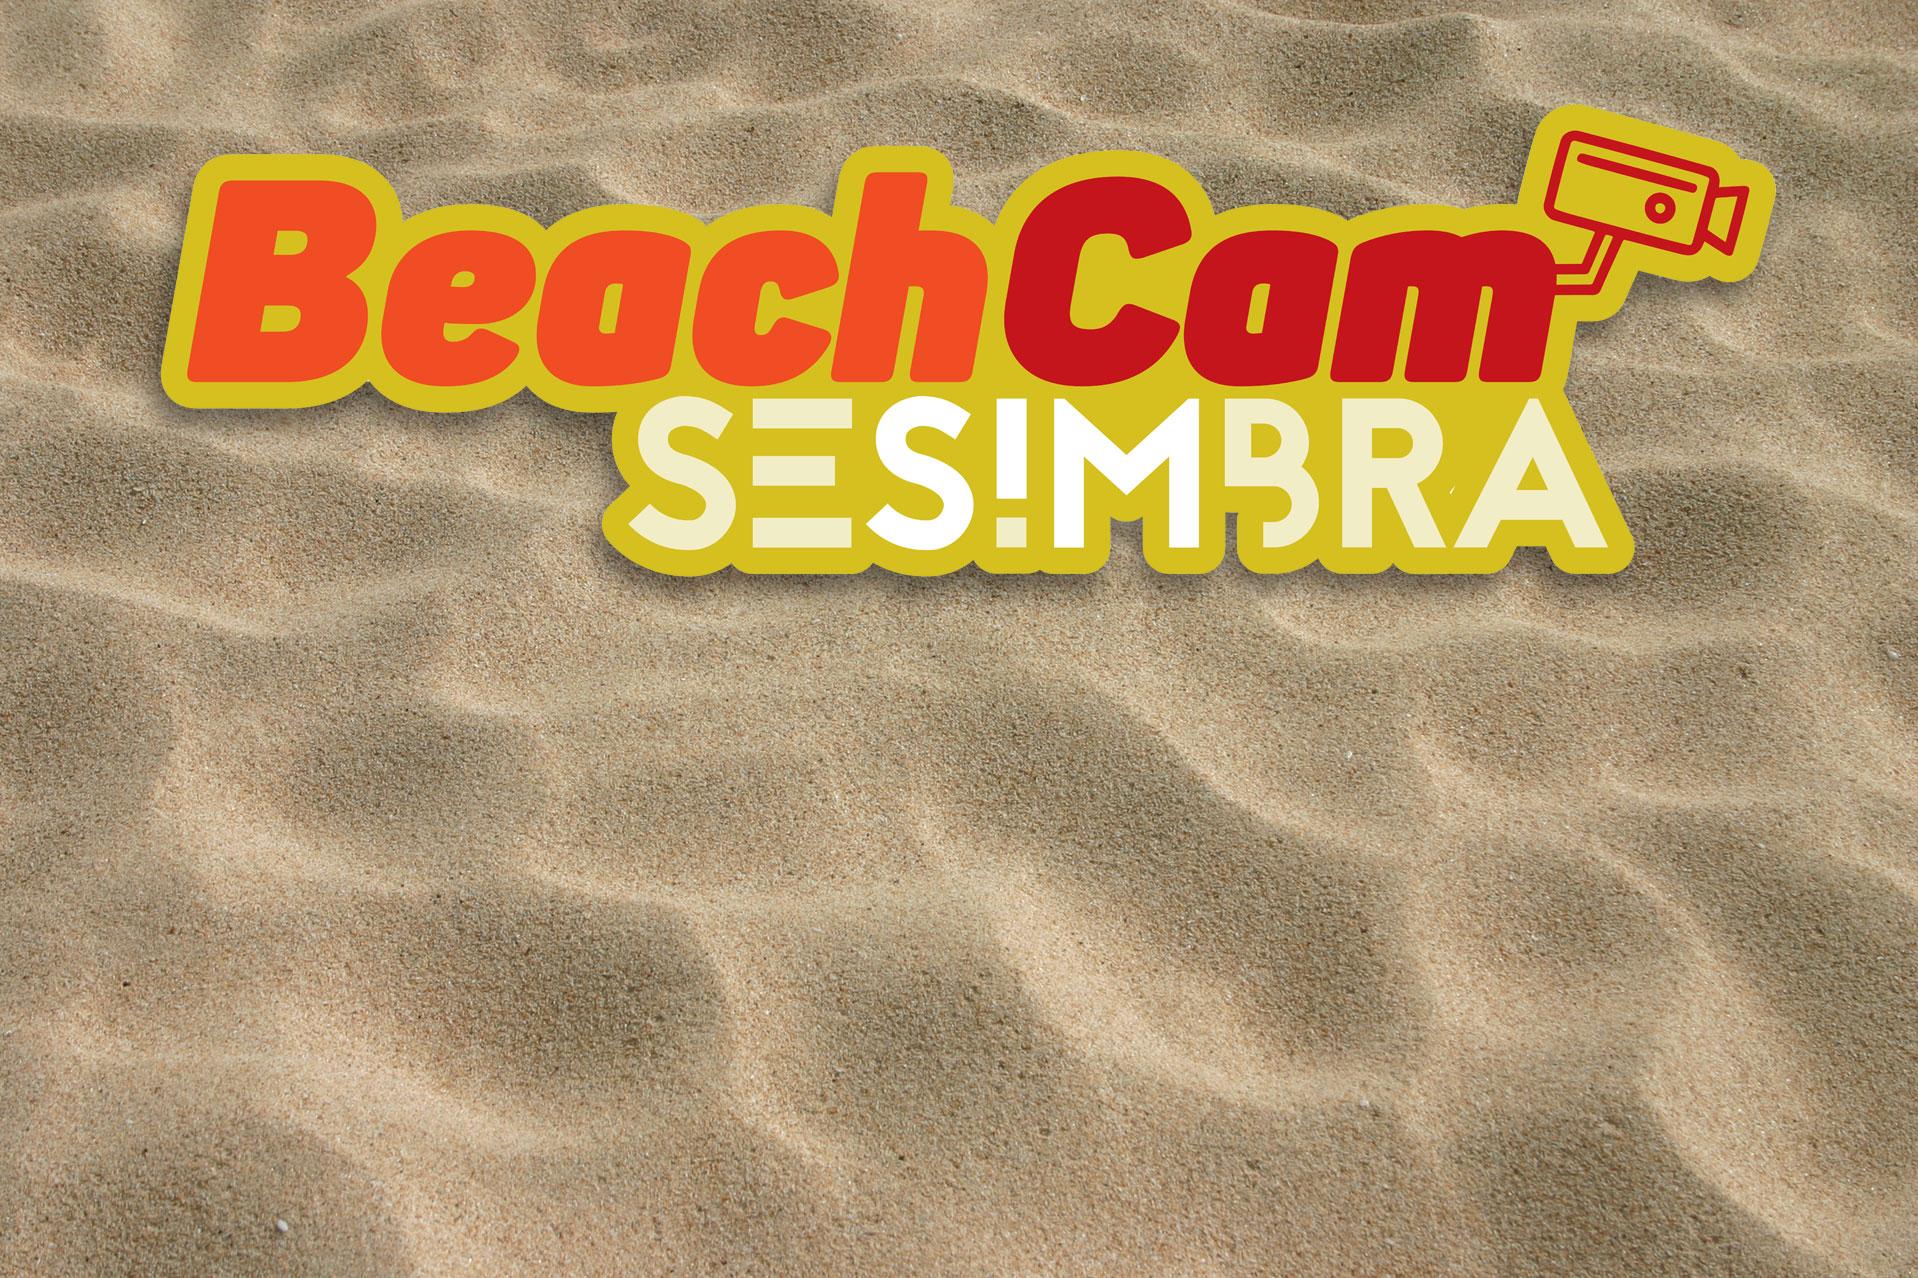 Beachcams